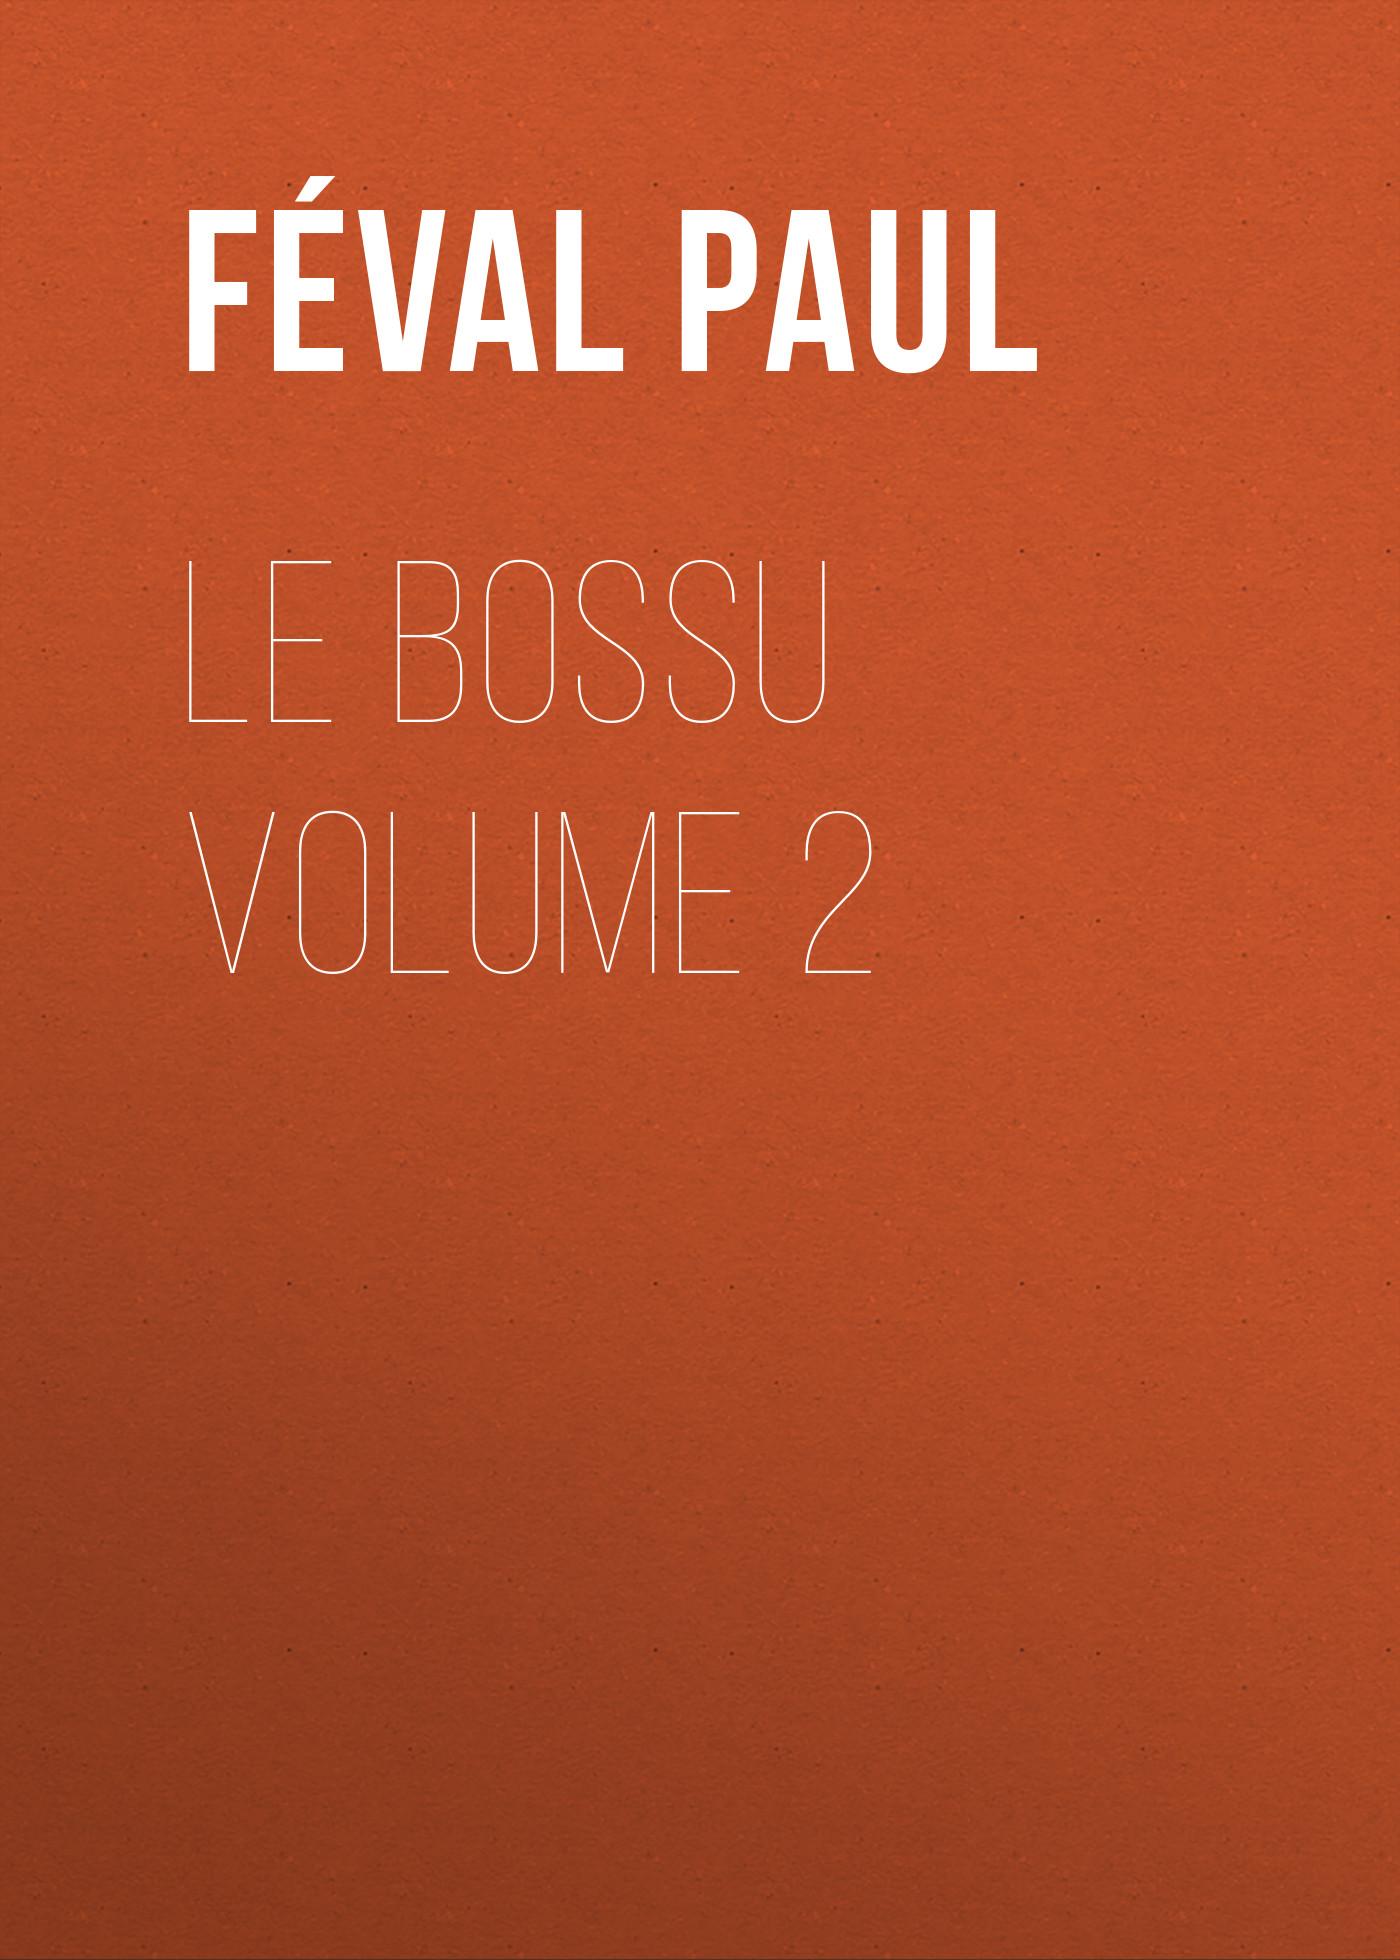 Féval Paul Le Bossu Volume 2